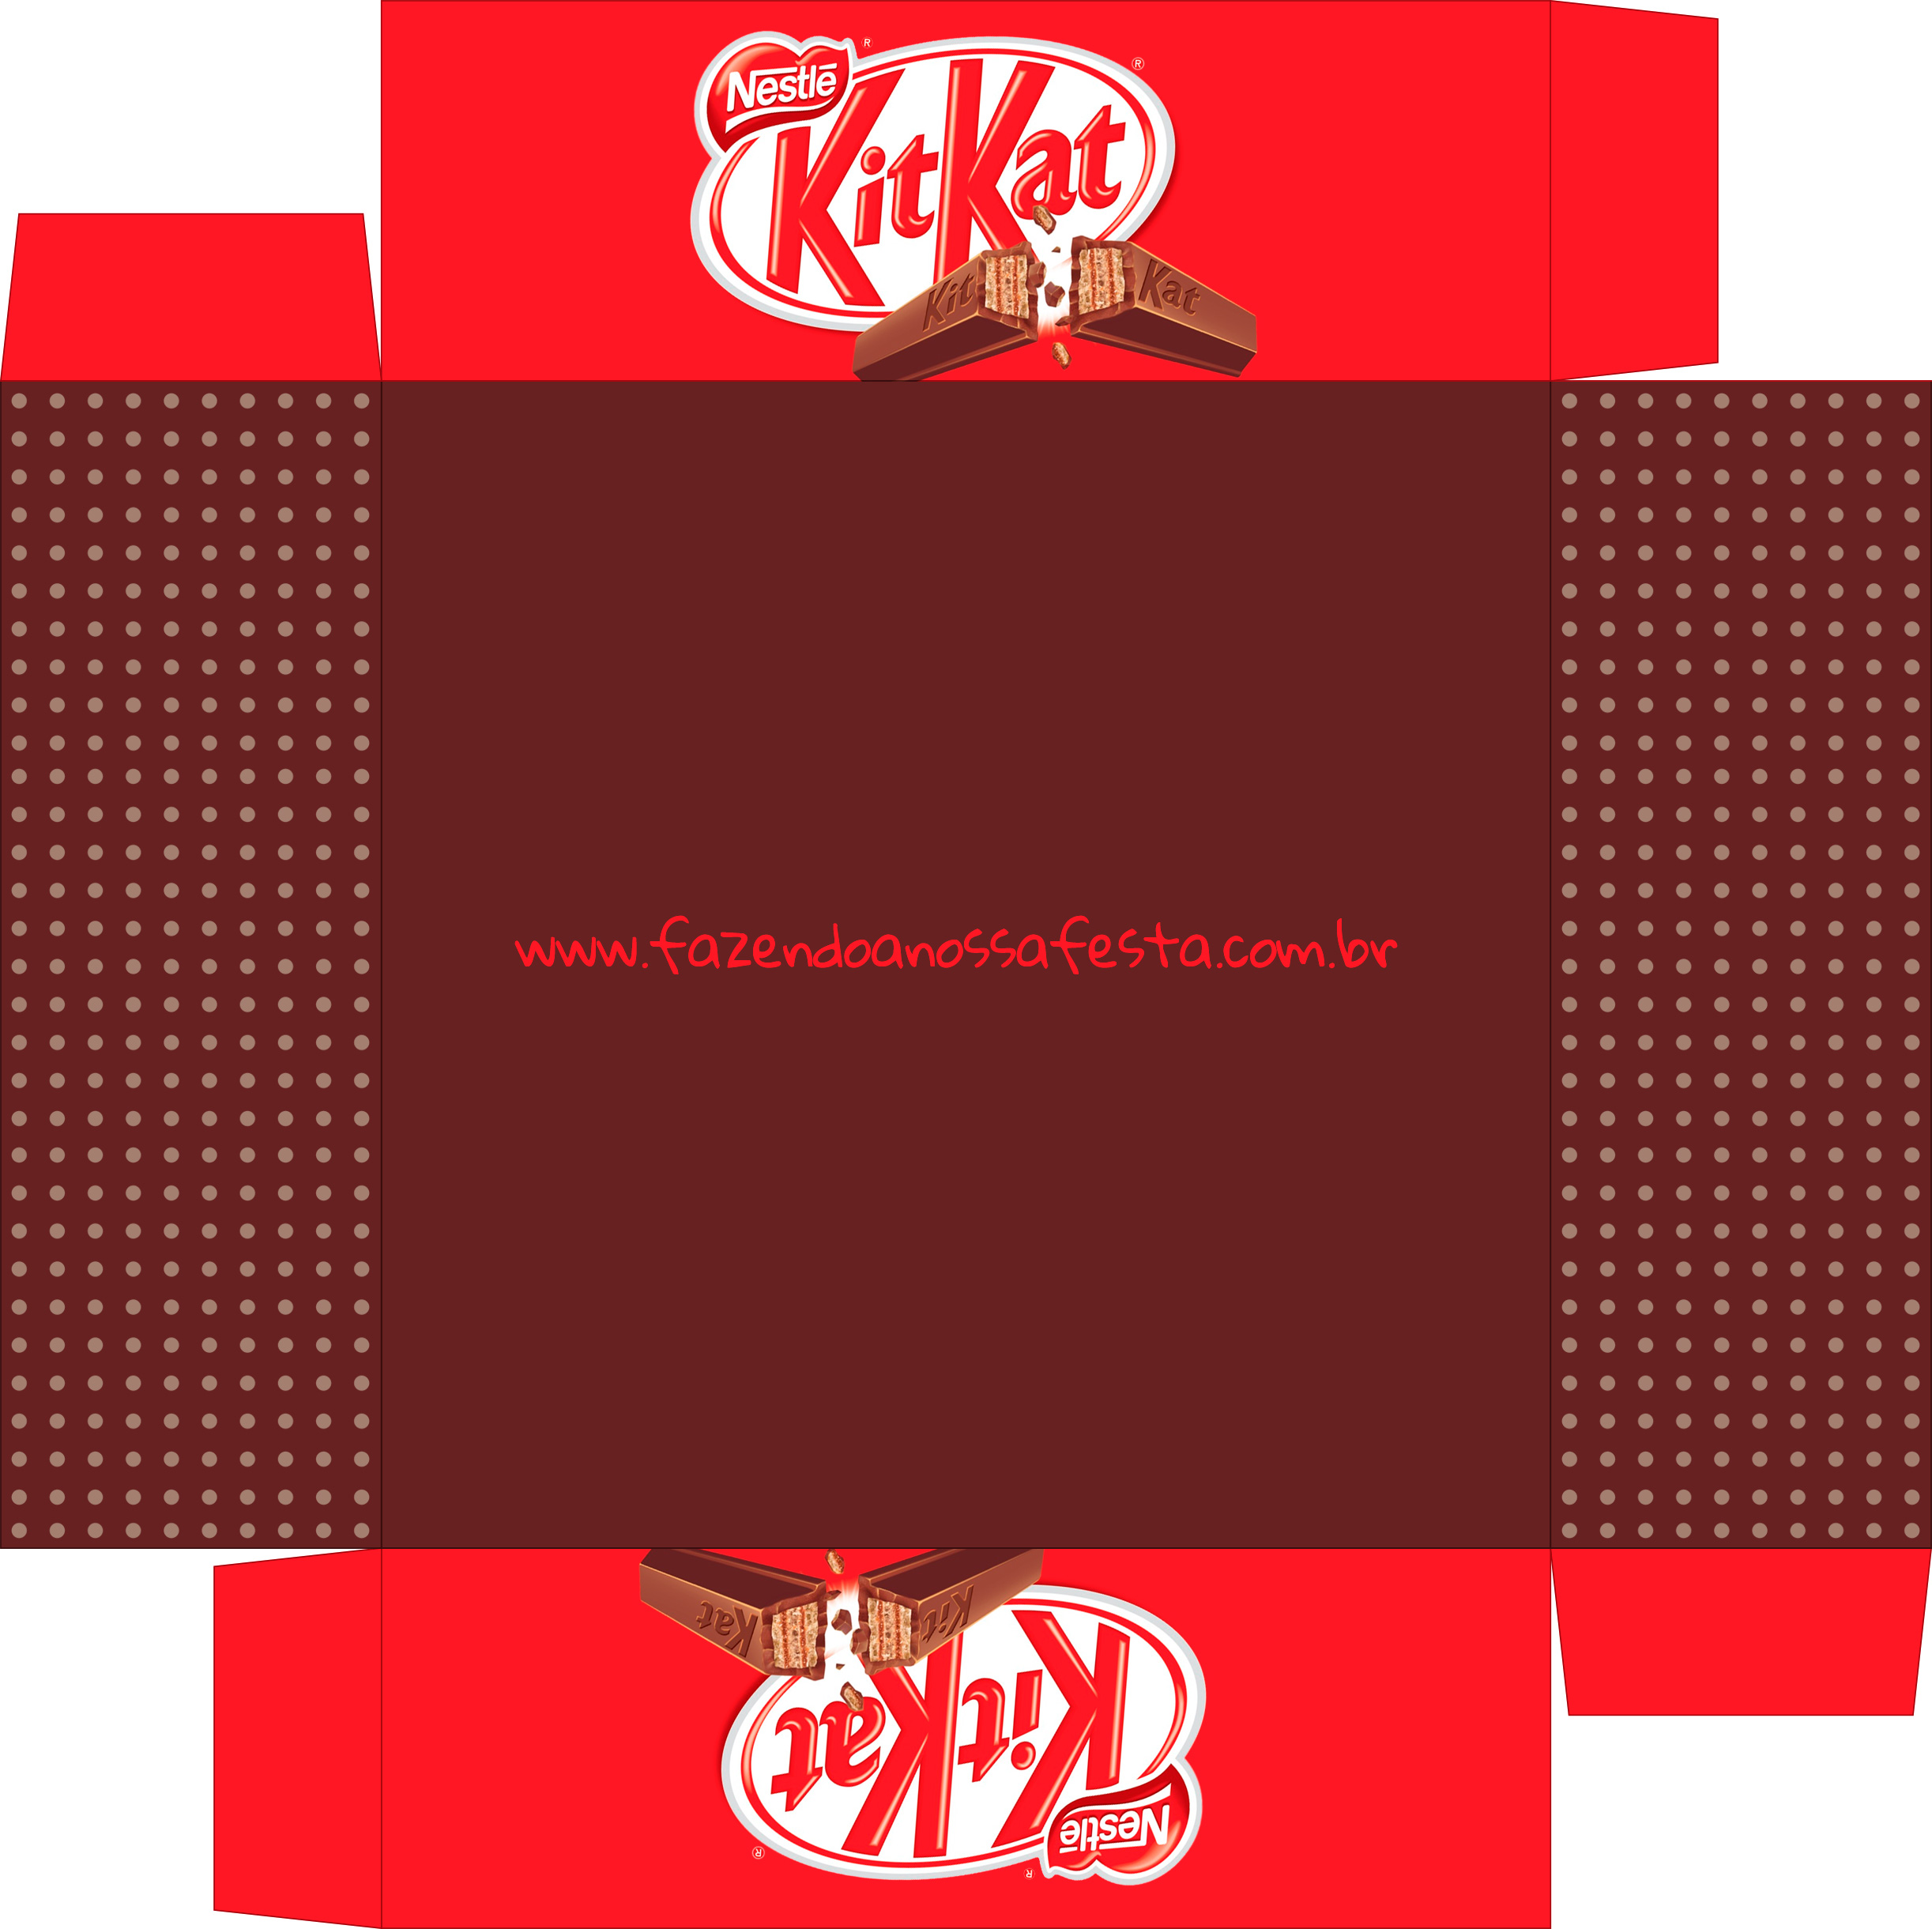 Caixa de Bombom Dia dos Namorados Kit Kat - Parte de baixo